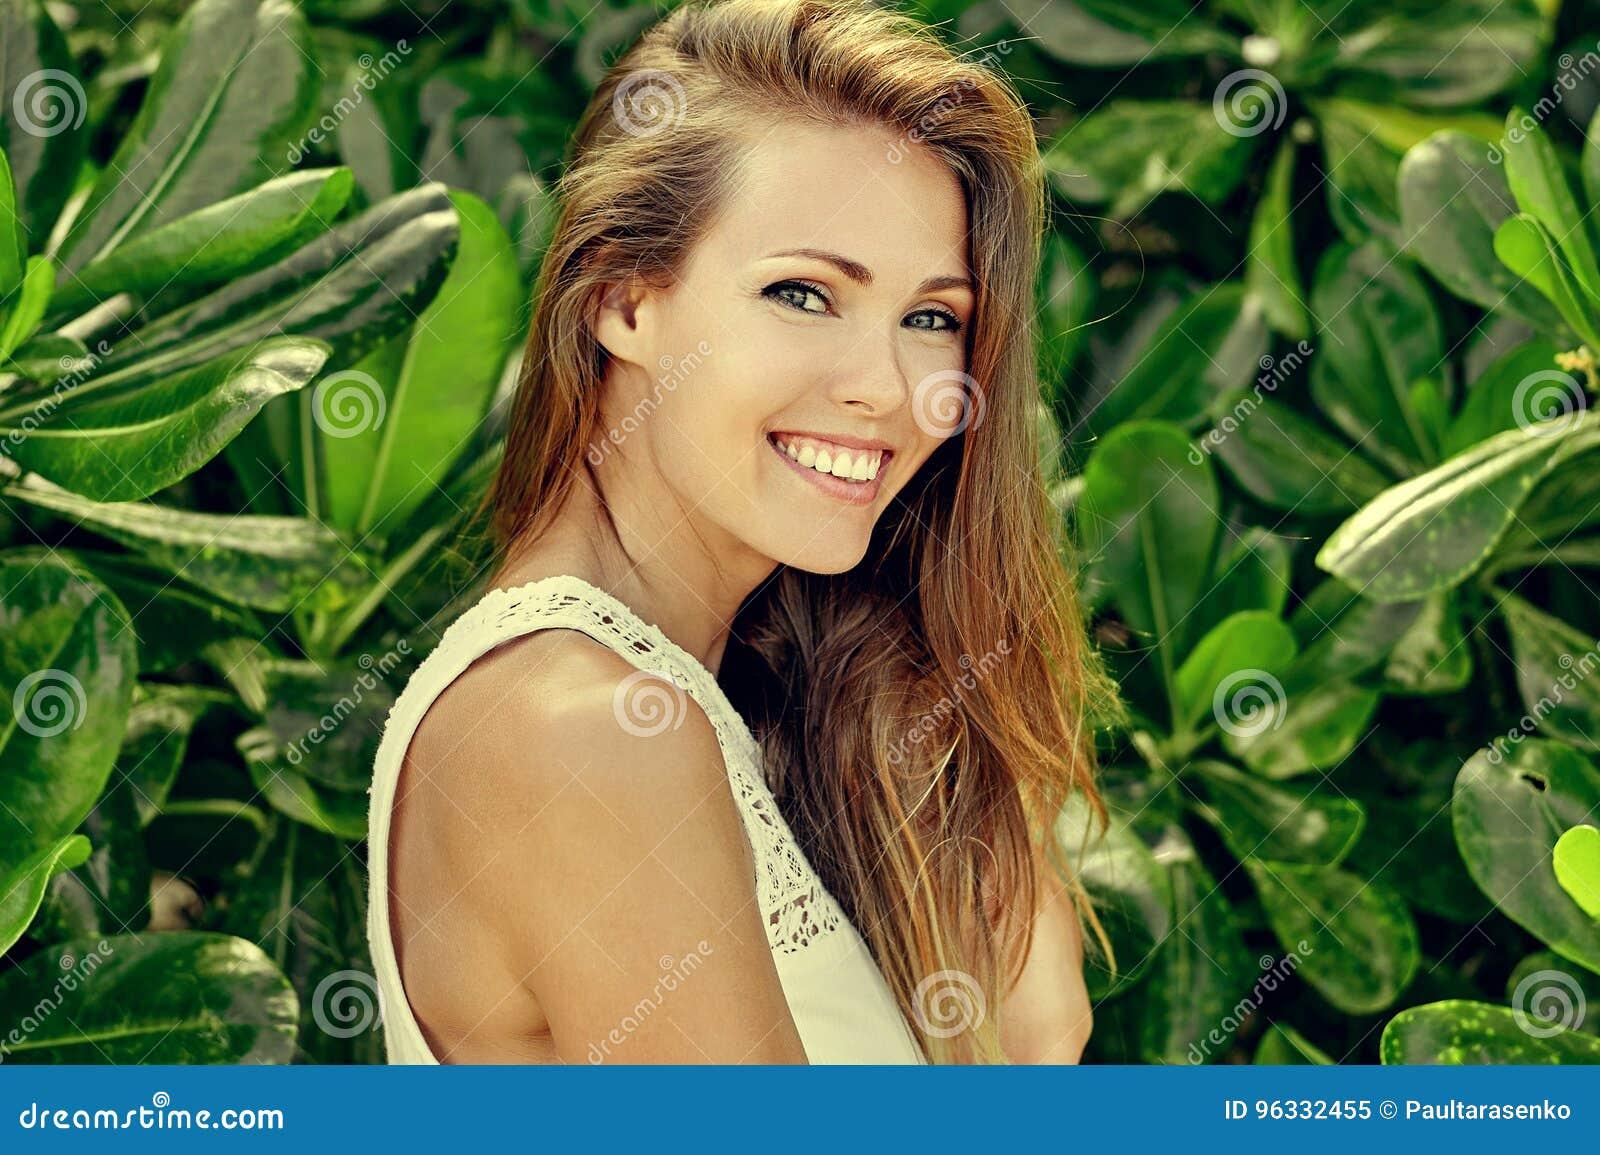 Mooi glimlachend meisje in groene tuin - sluit omhoog